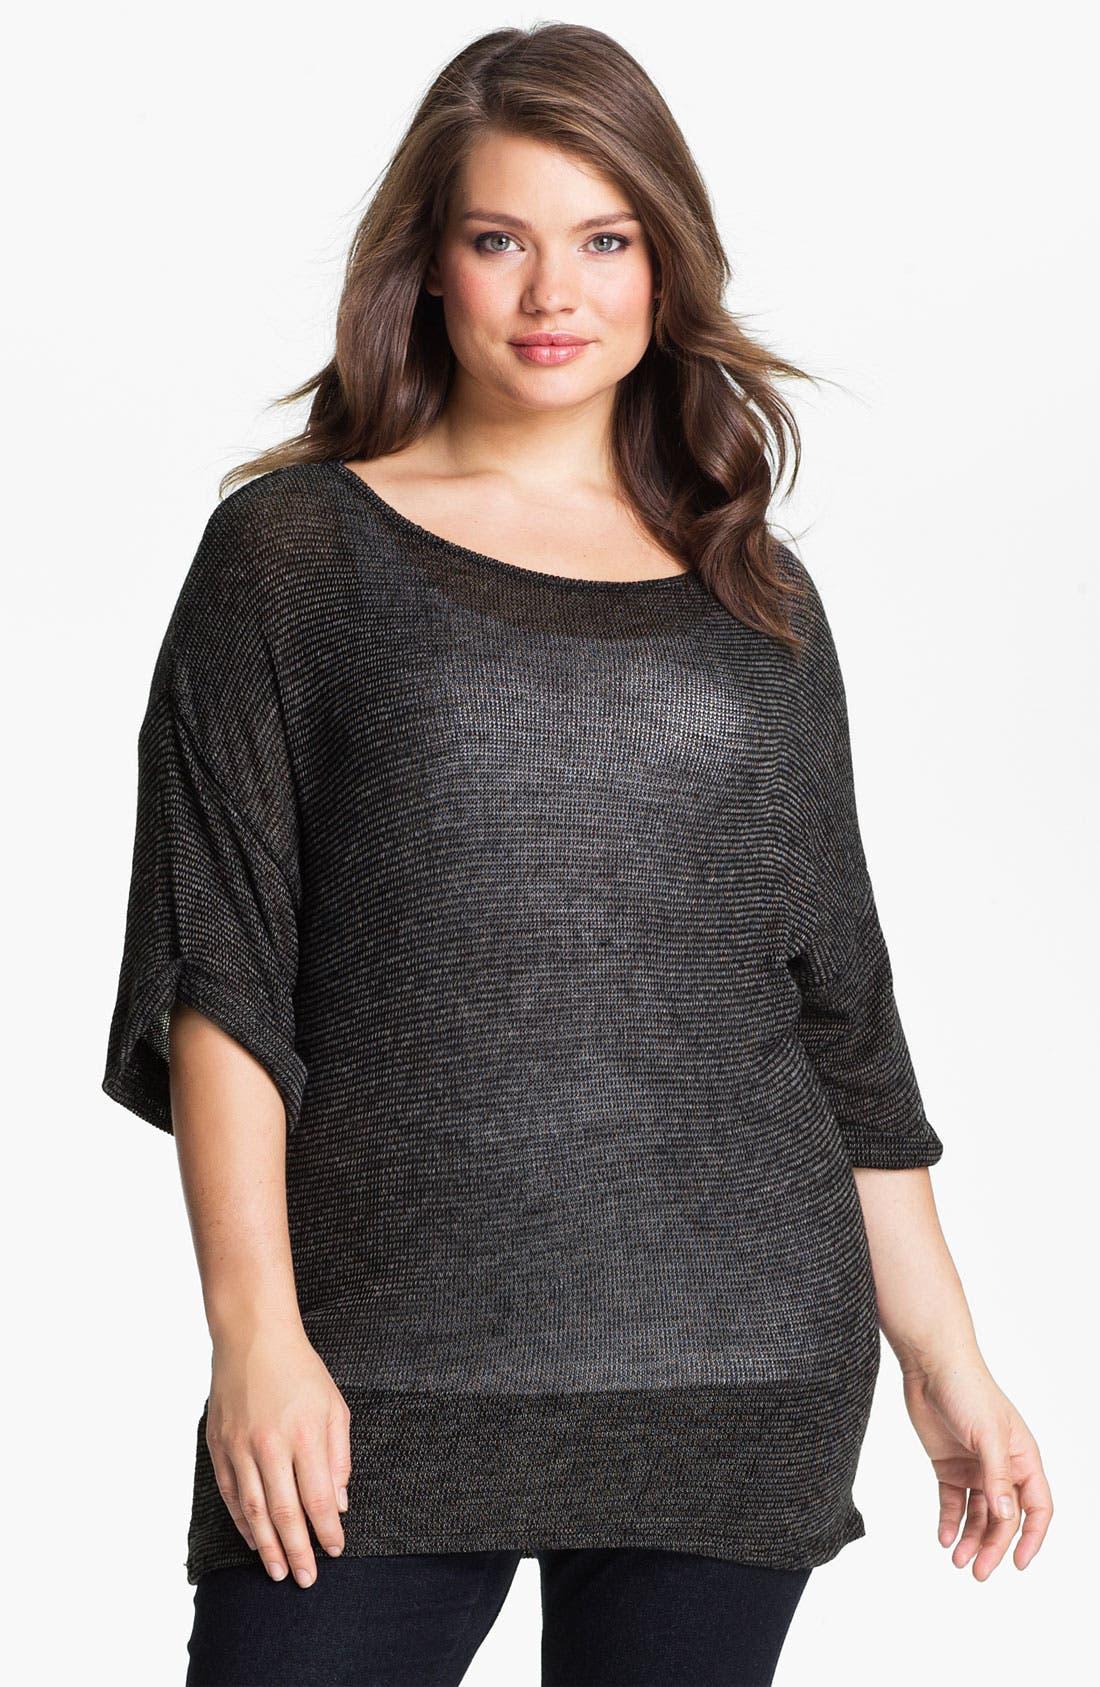 Alternate Image 1 Selected - Nation LTD 'Helena' Sweater (Plus)